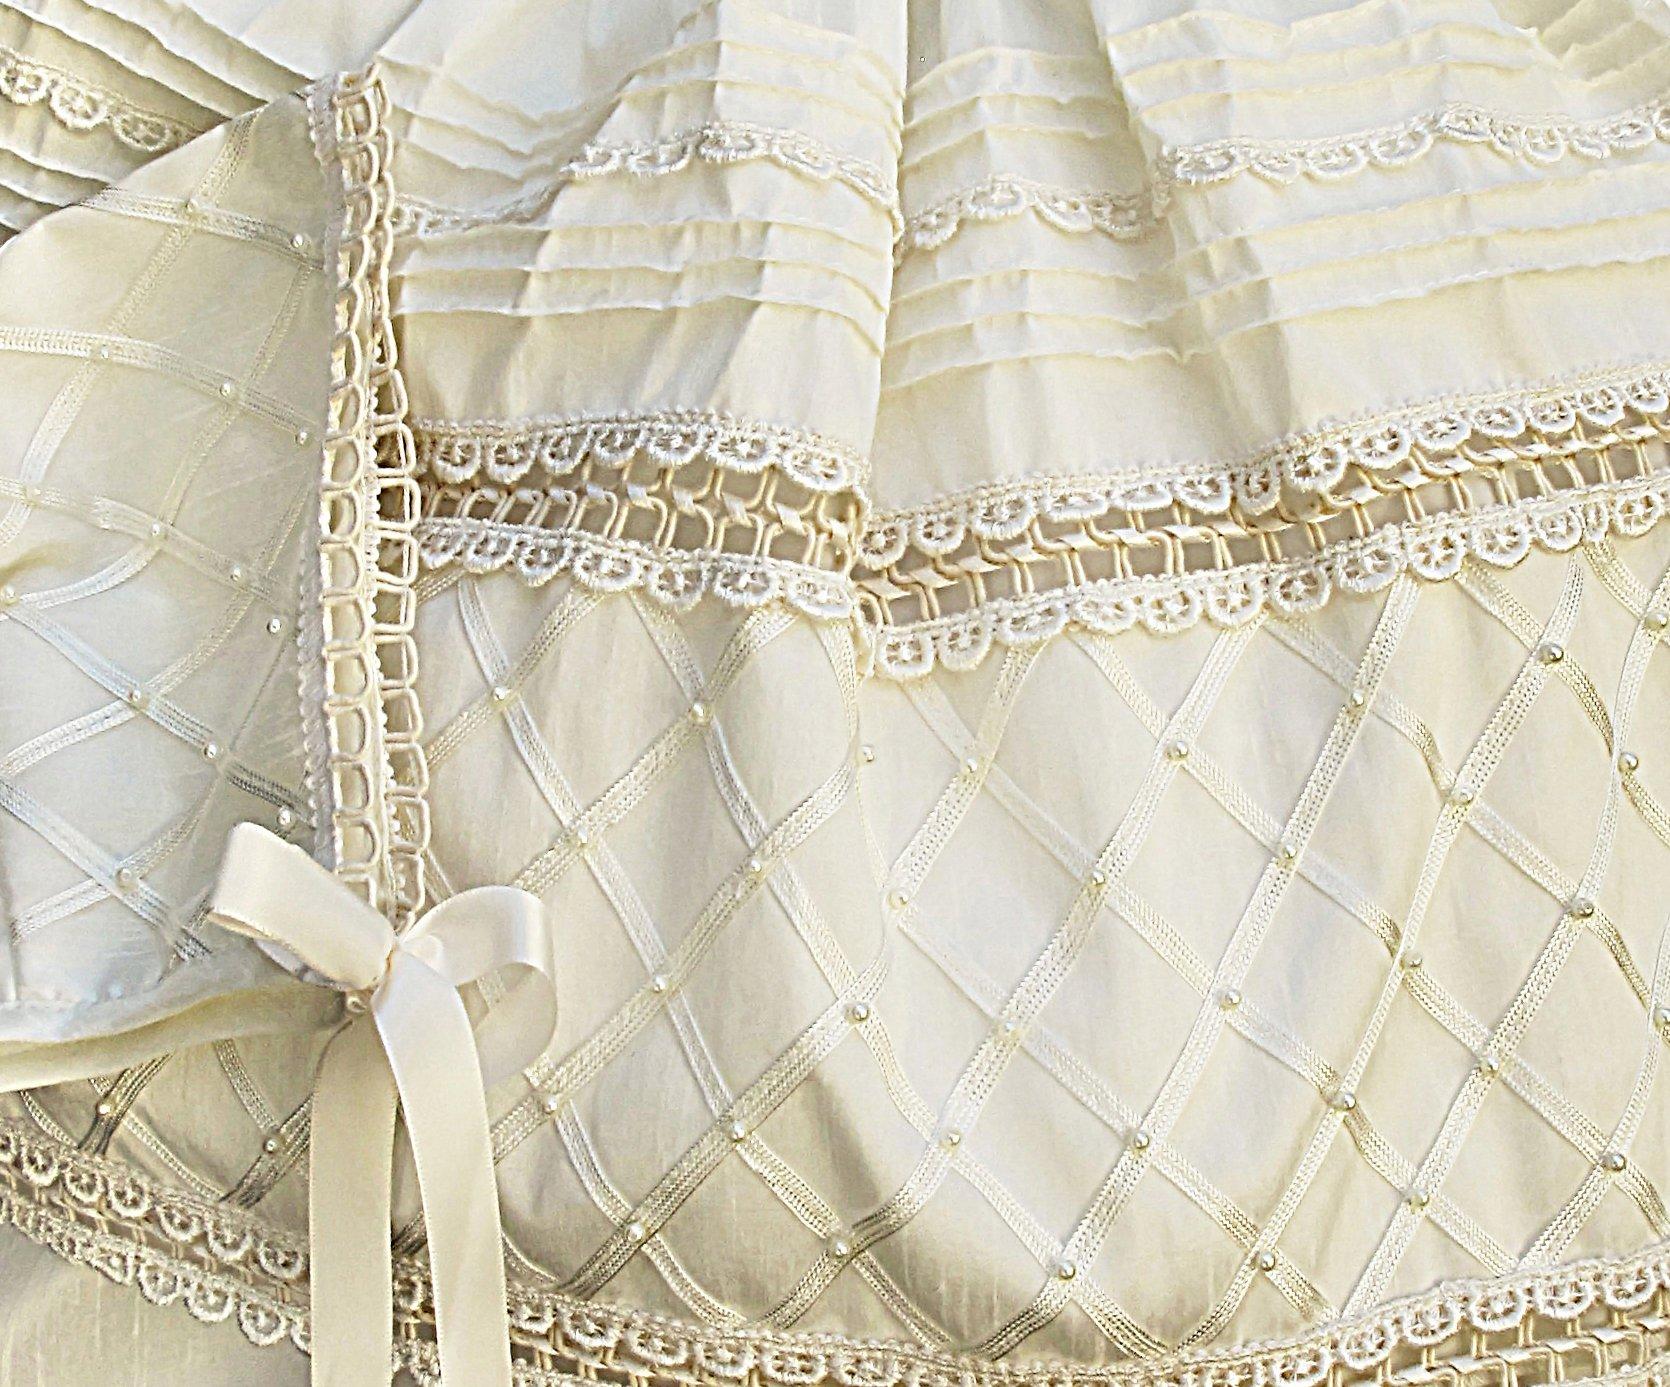 Baby-girls Heirloom Christening Baptism Gown Dress (Burbvus Ropones) Handmade - Silk by Burbvus (Image #1)